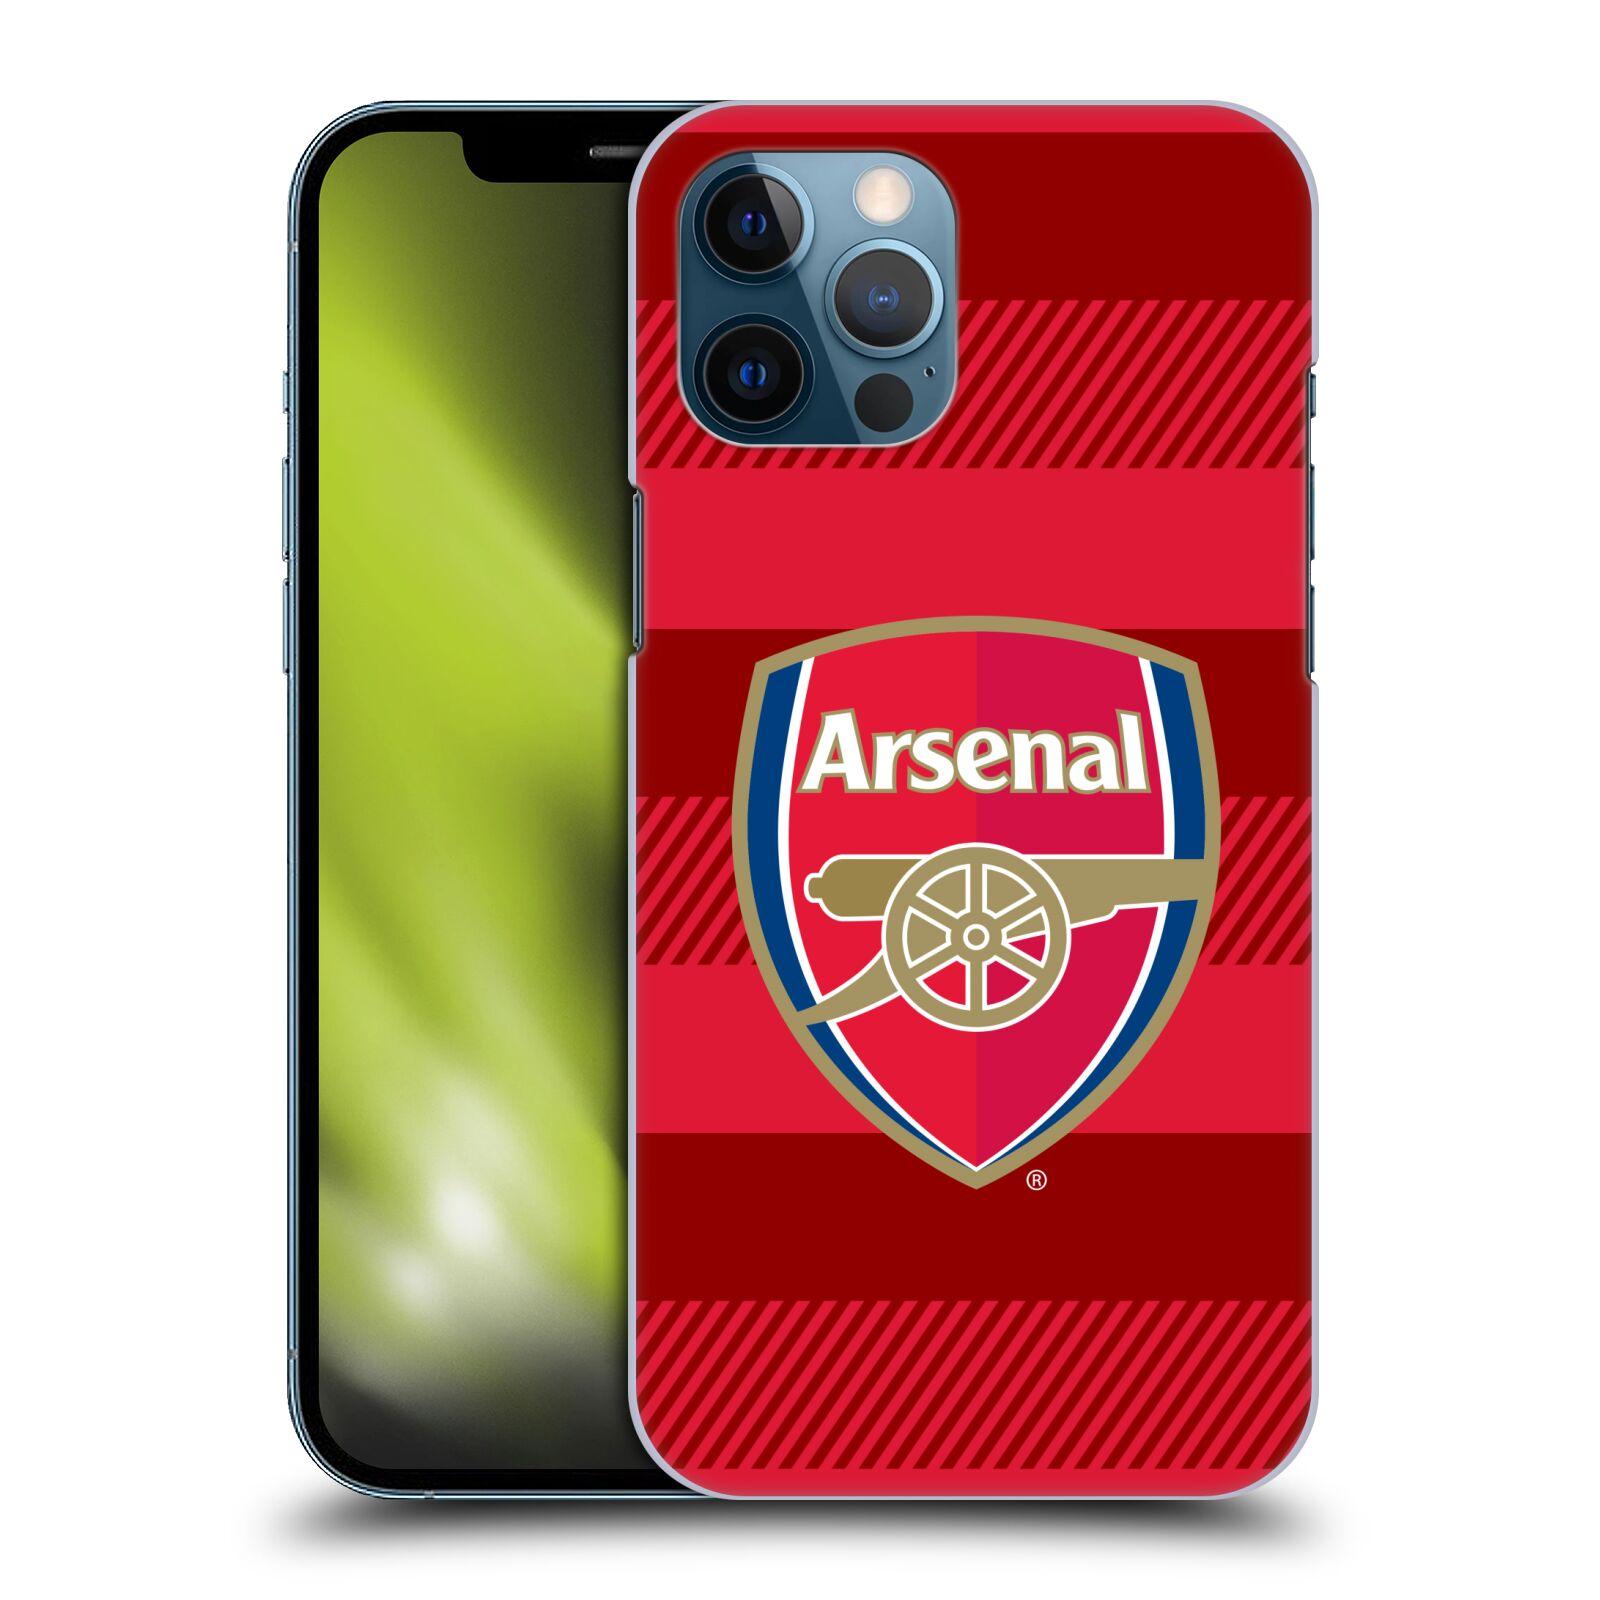 Plastové pouzdro na mobil Apple iPhone 12 Pro Max - Head Case - Arsenal FC - Logo s pruhy